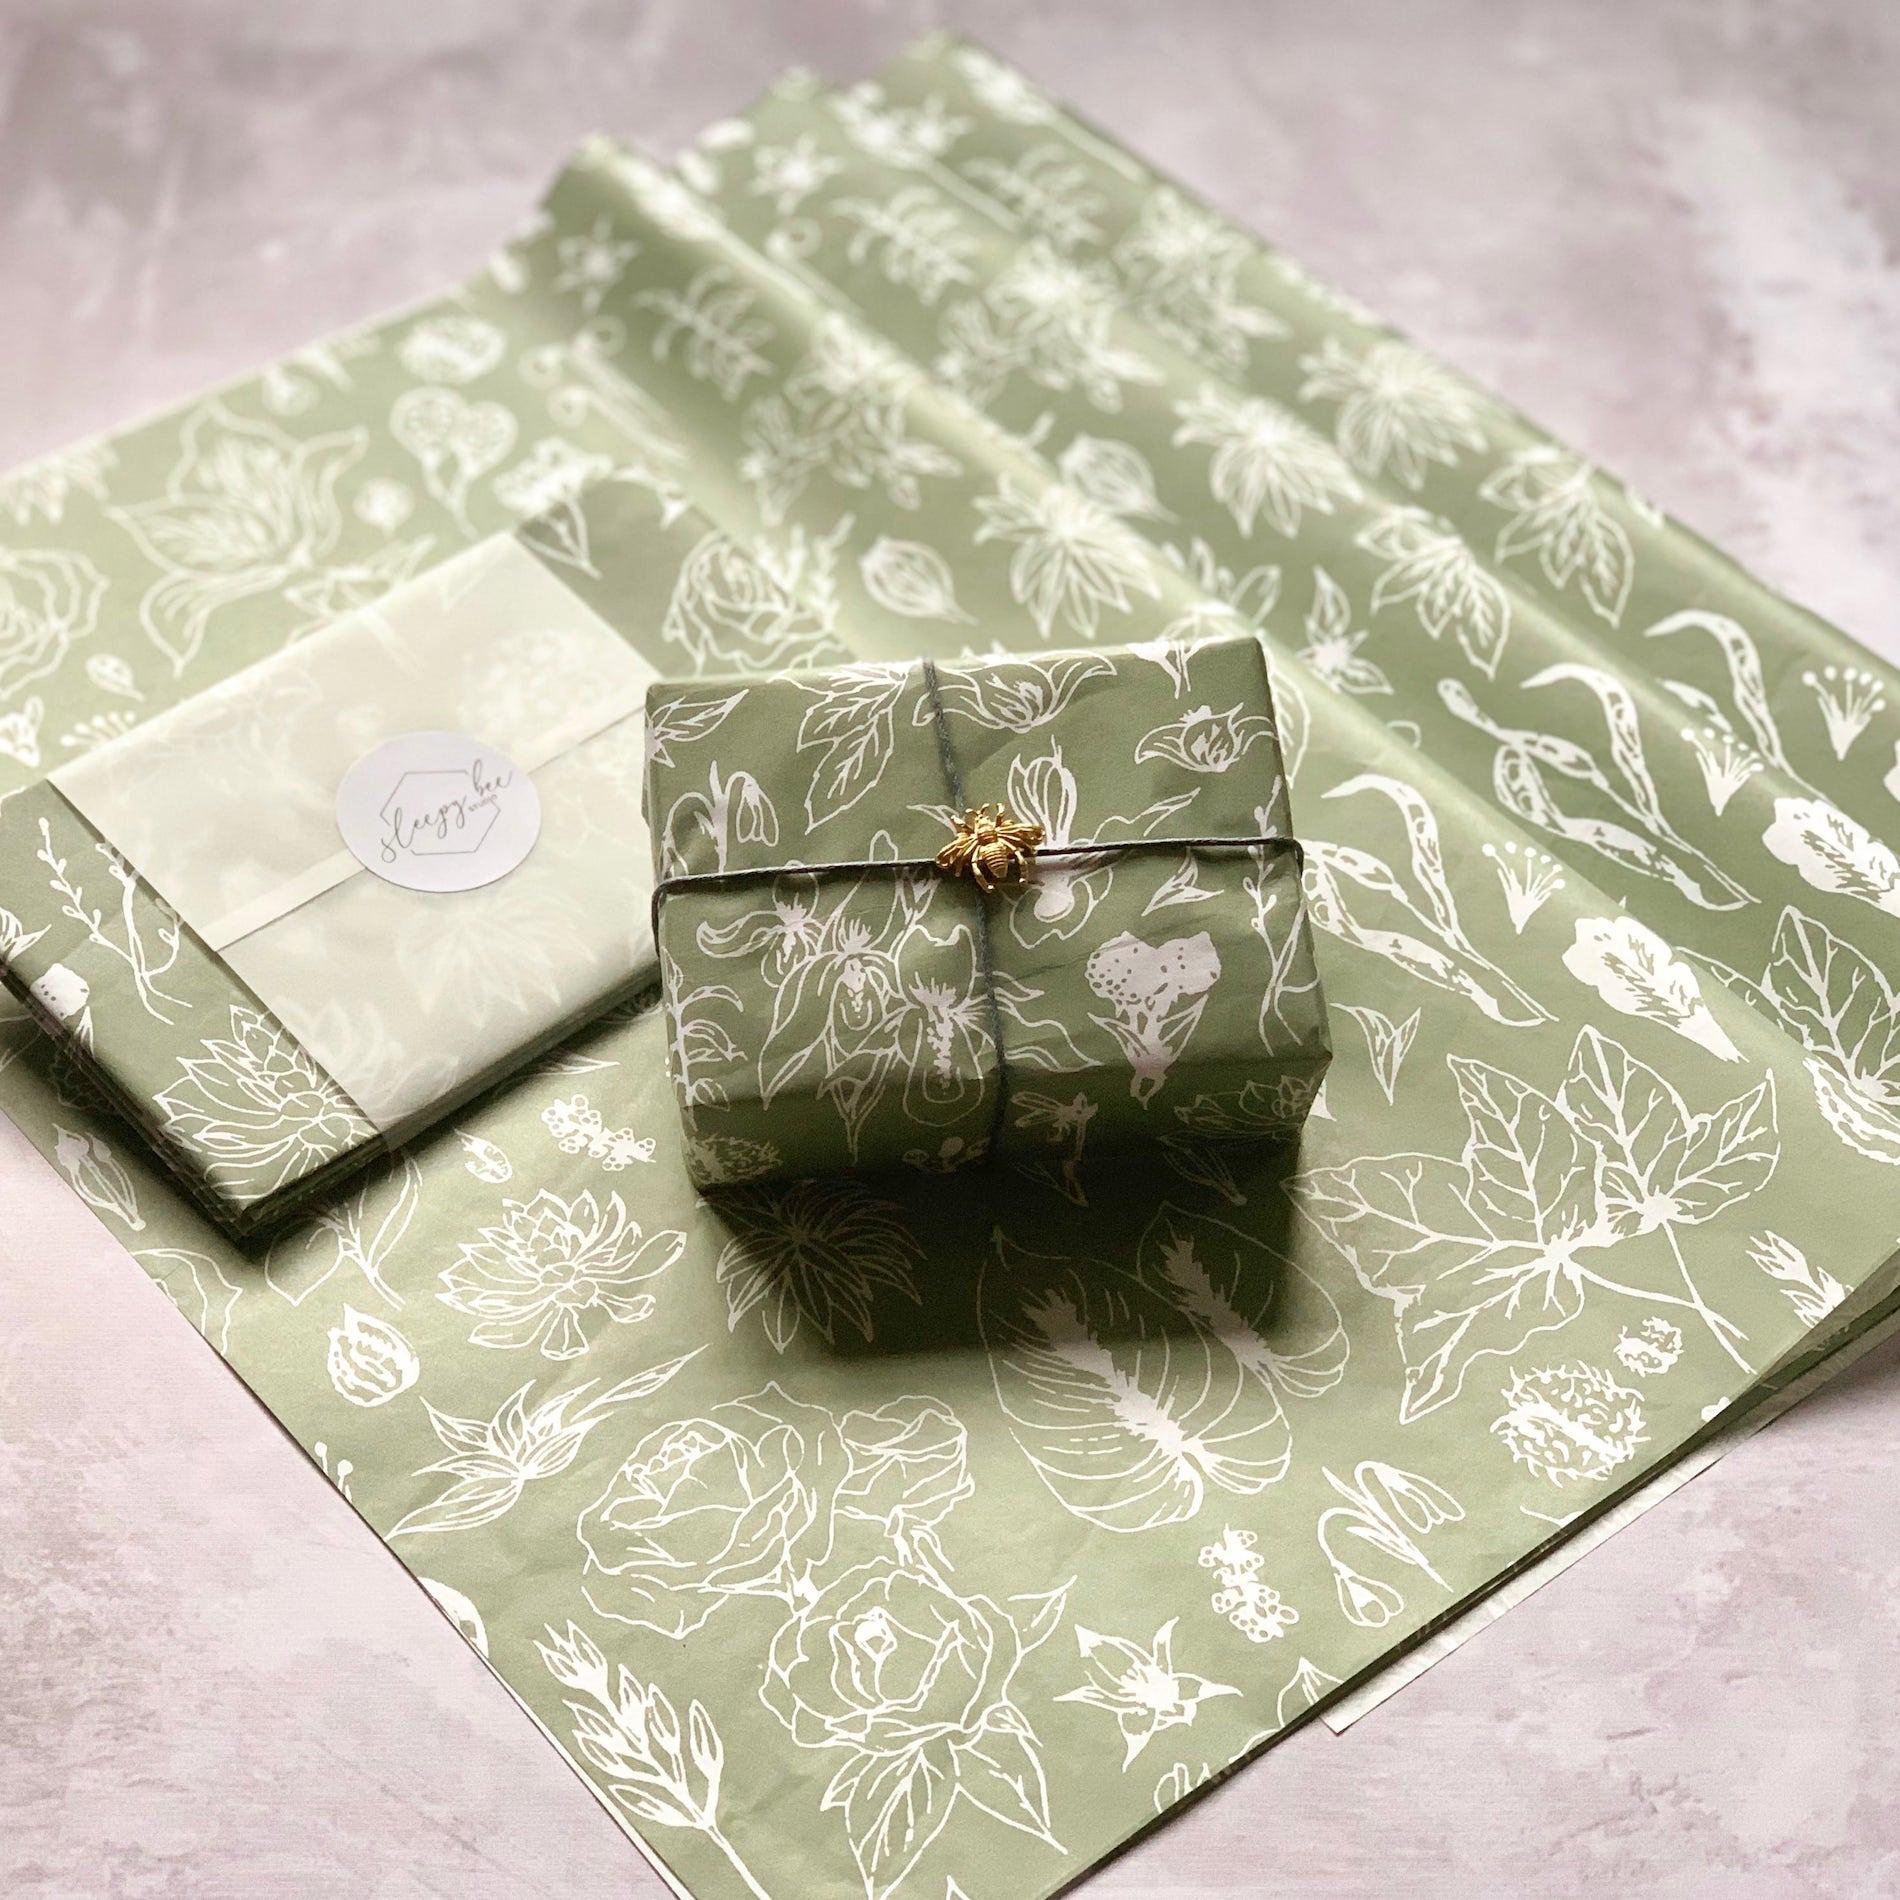 Sleepy Bee Studio Botanical custom tissue paper design